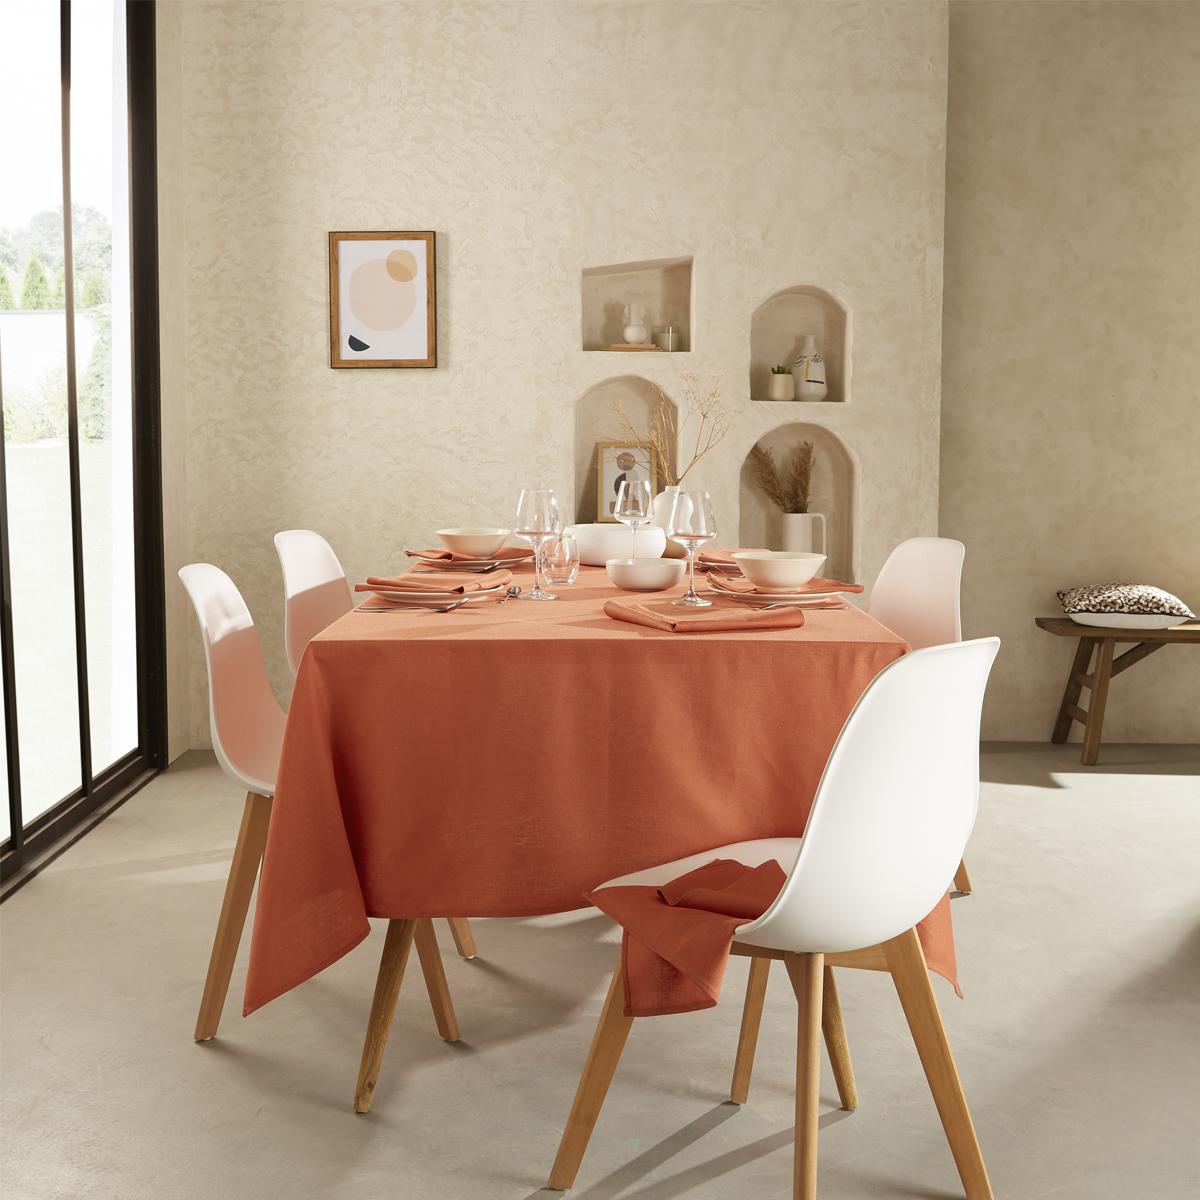 Nappe unie en polylin tangerine 180 x 300